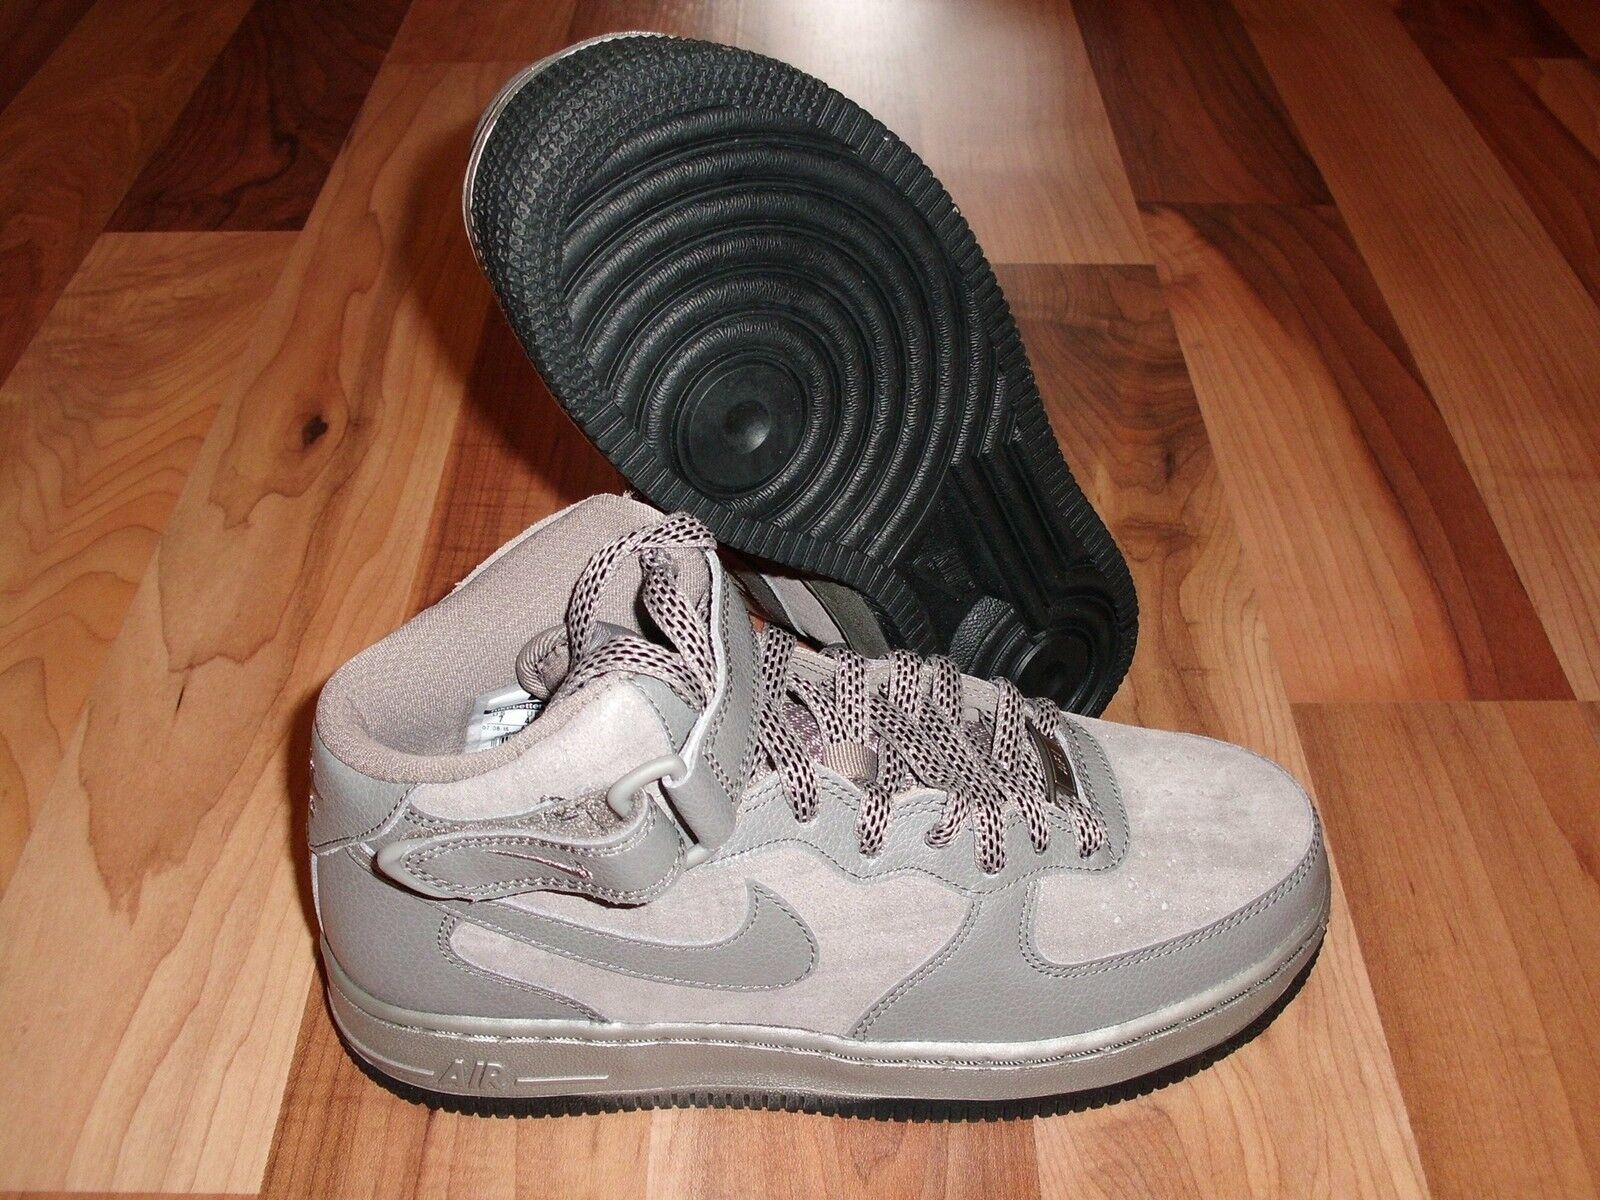 Nike WMNS AIR FORCE 1 MID PRM '07 Metallic grigio 805292 002 SZ 6.5 NEW